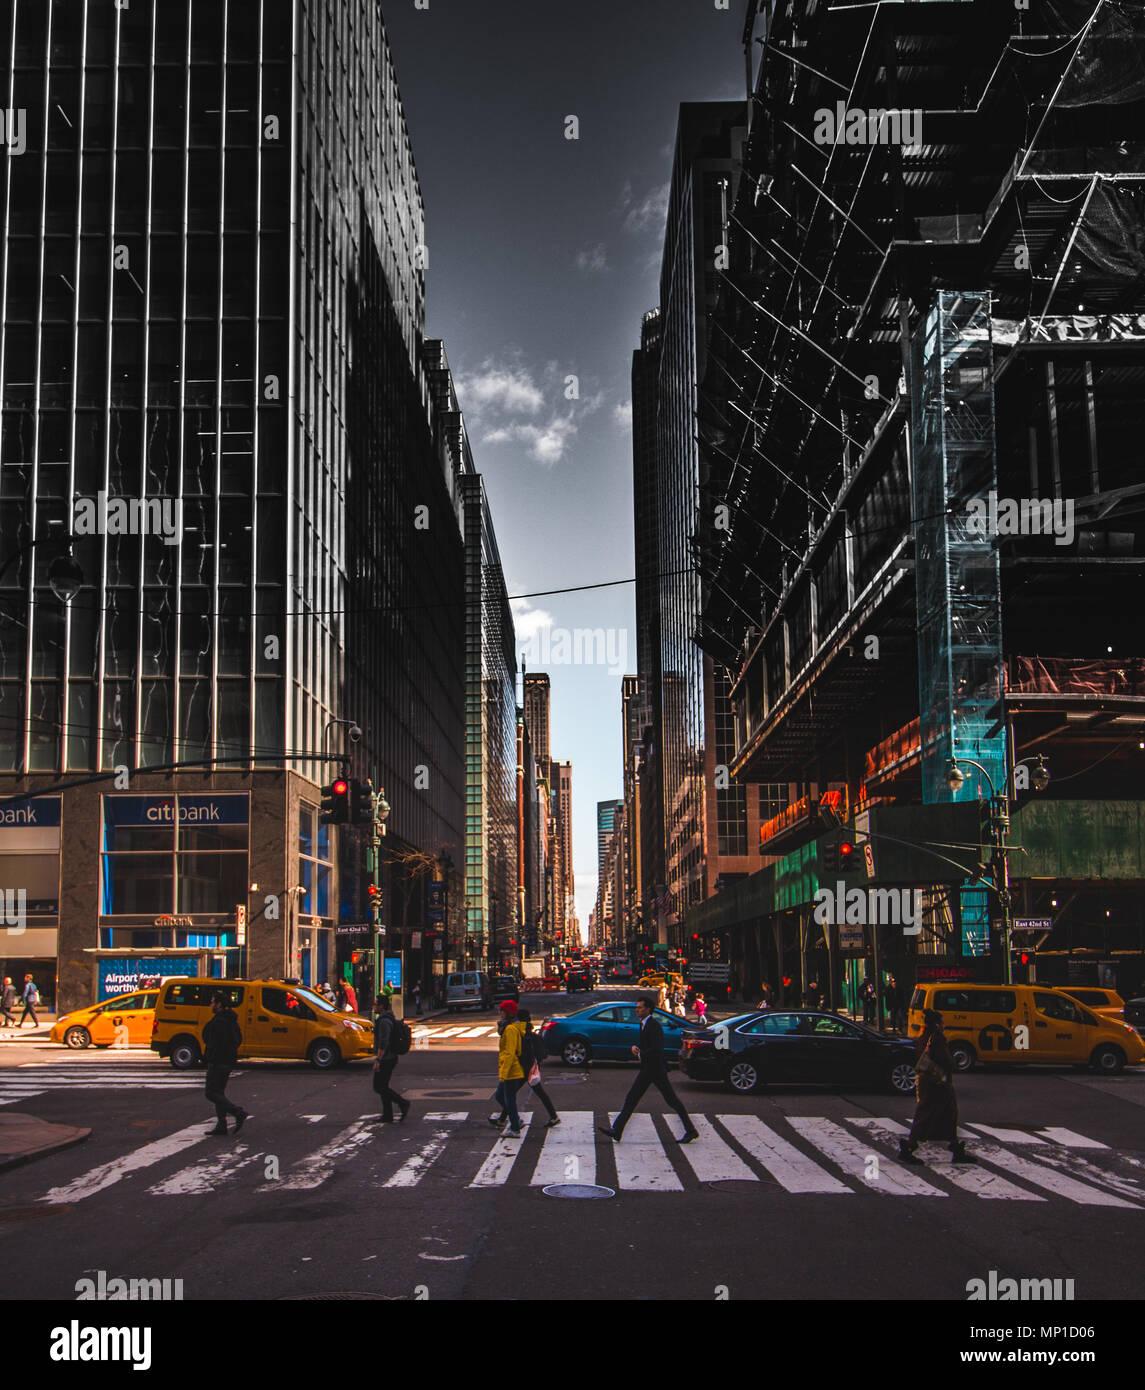 Manhattan Streets: Inspiring Street View Of Midtown Manhattan Stock Photo